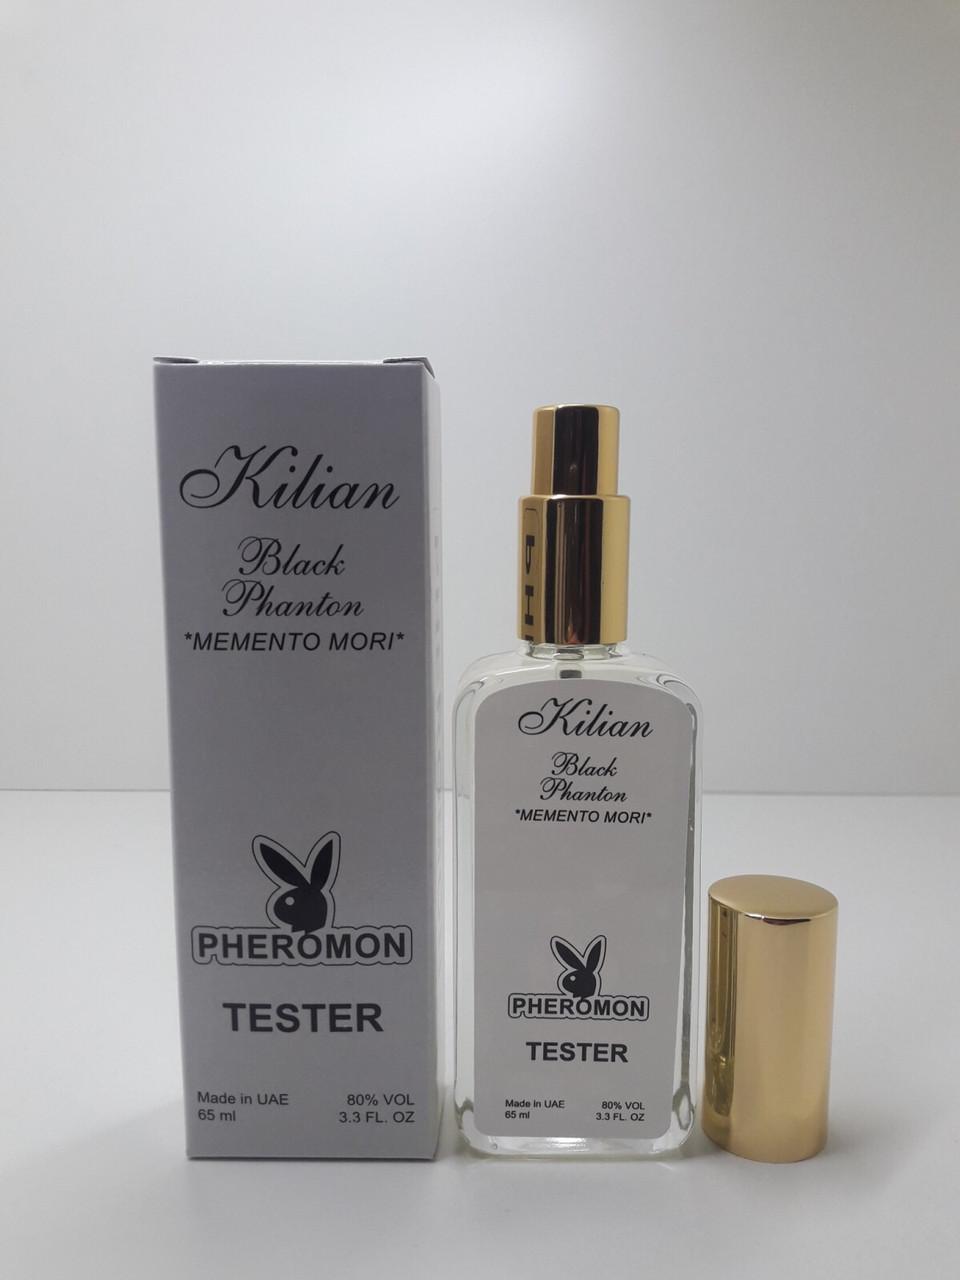 Тестер унисекс Black Phantom by Kilian Memento mori Pheromon 65 мл ОАЭ с феромонами (реплика)